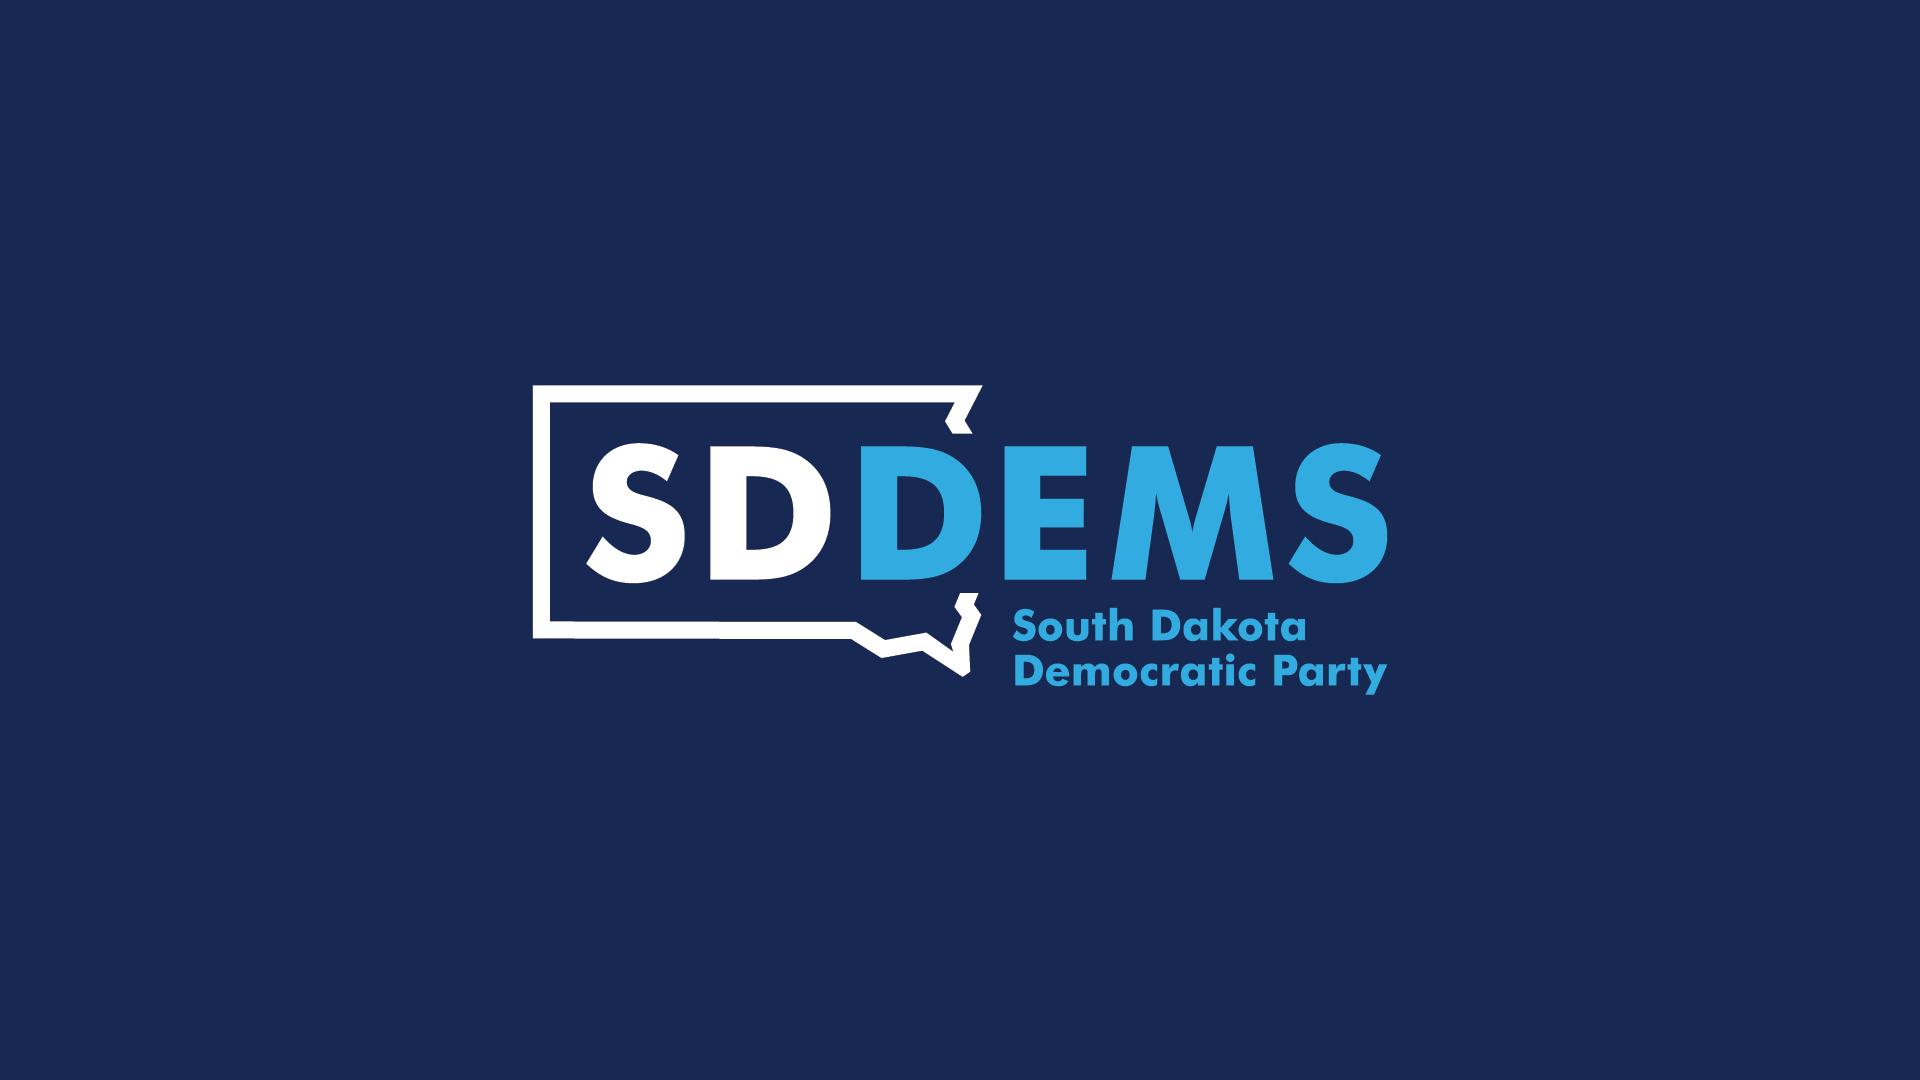 South Dakota Democrats